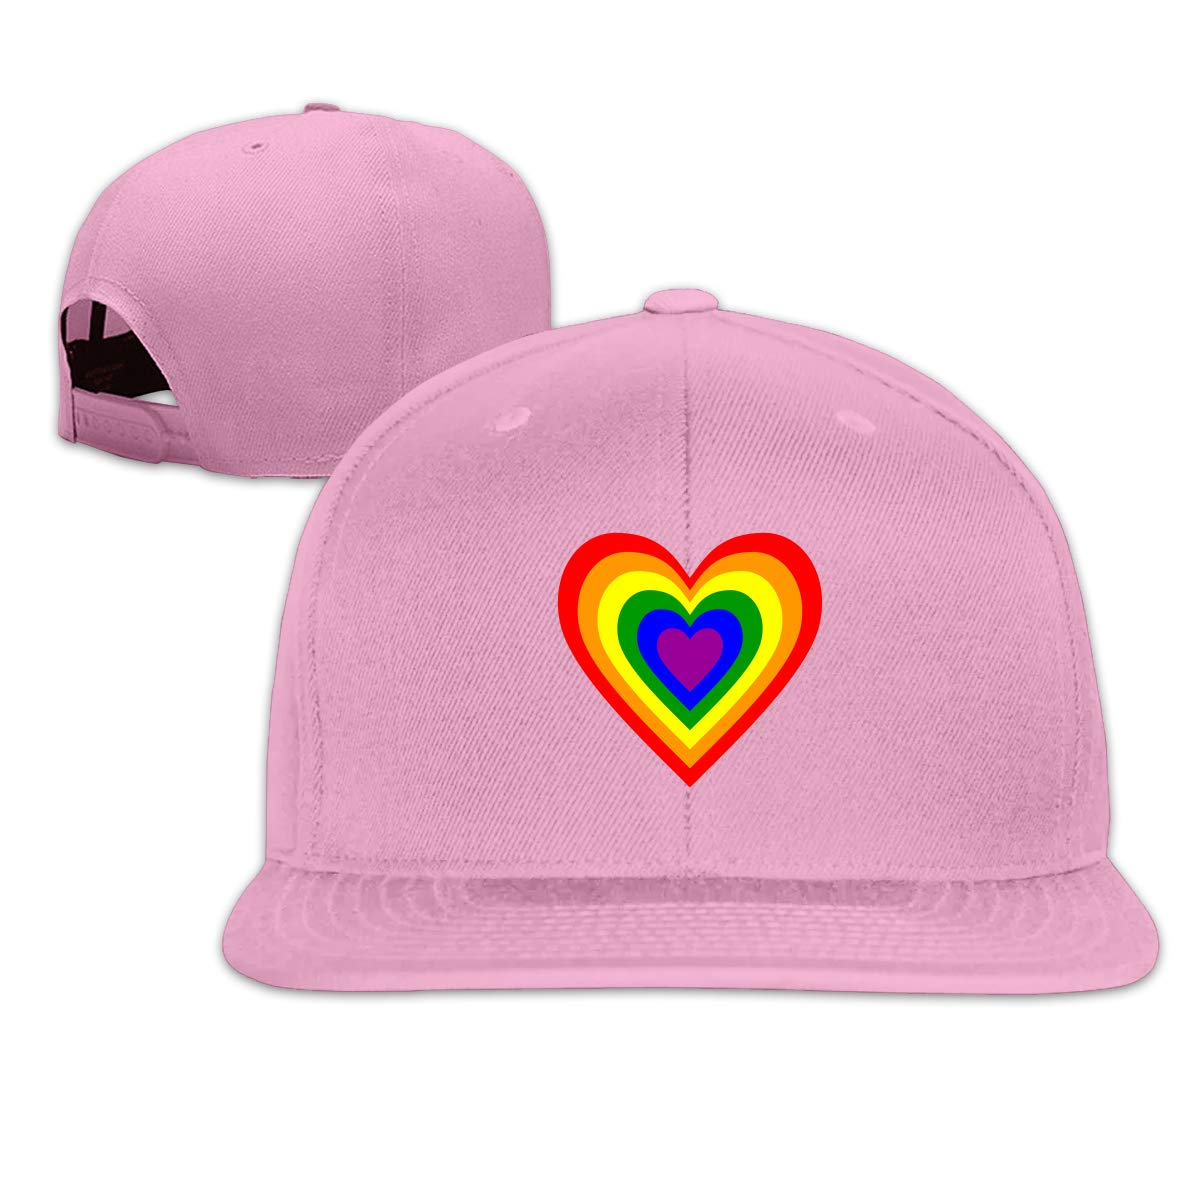 MOCSTONE Unisex Snapback Hat LGBT Rainbow Heart Adjustable Baseball Cap